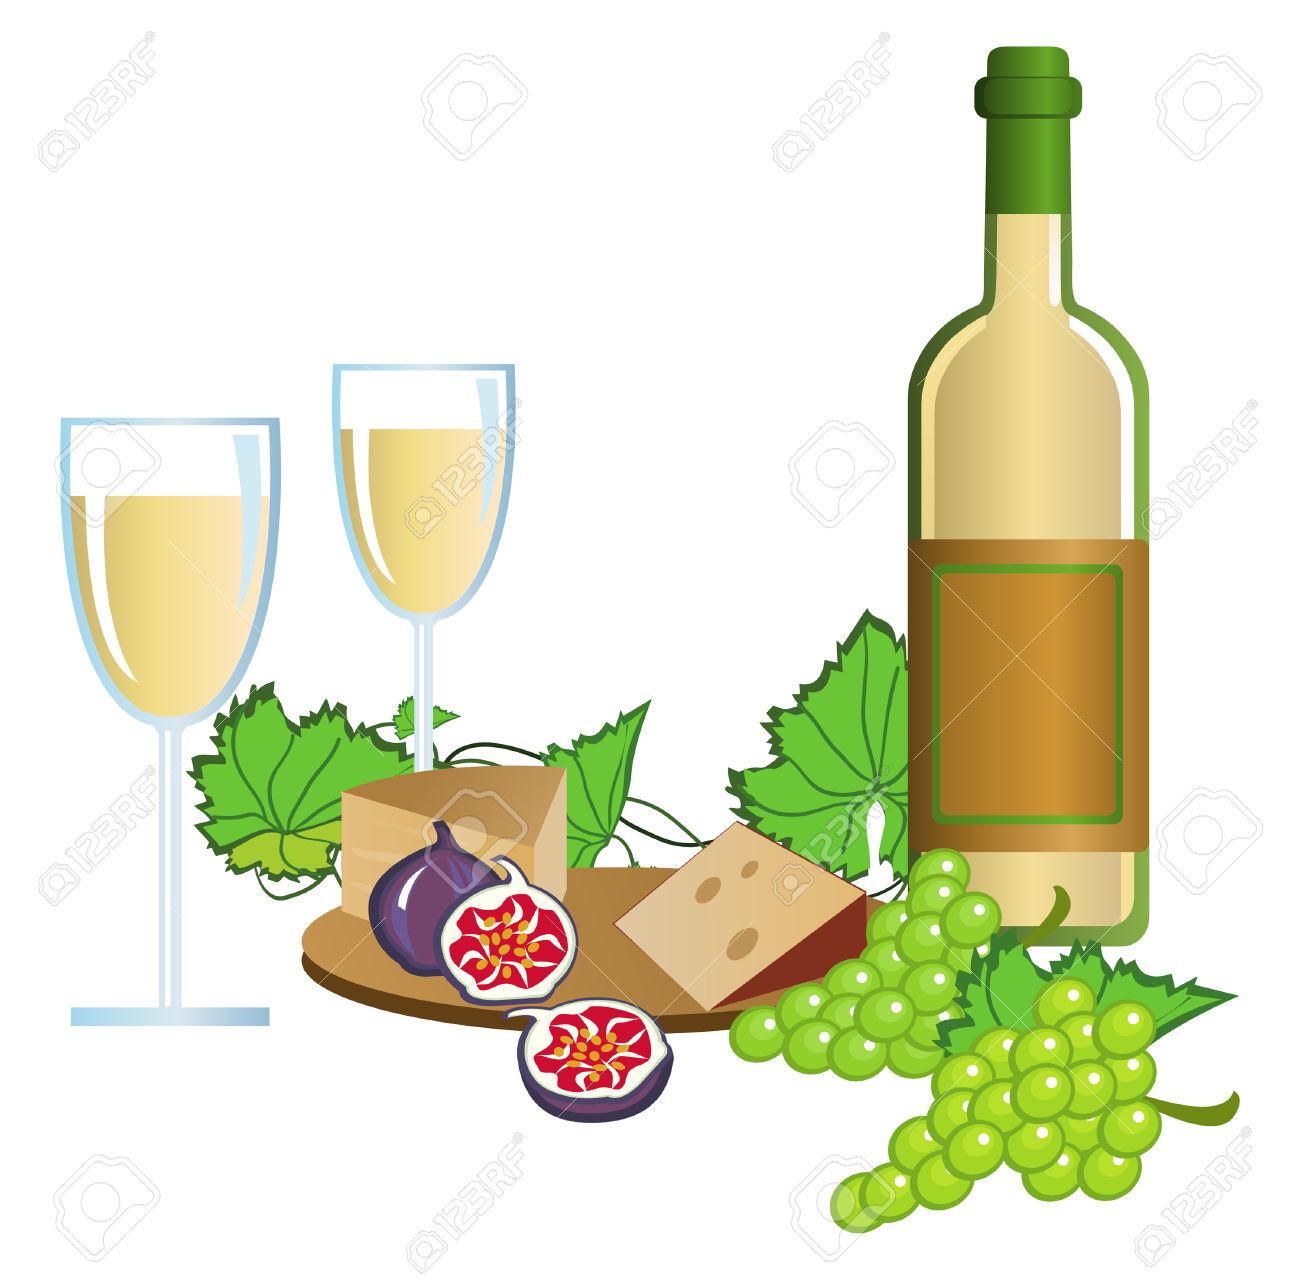 Wine Tasting Clipart Free Clip Art Image-Wine Tasting Clipart Free Clip Art Images-17